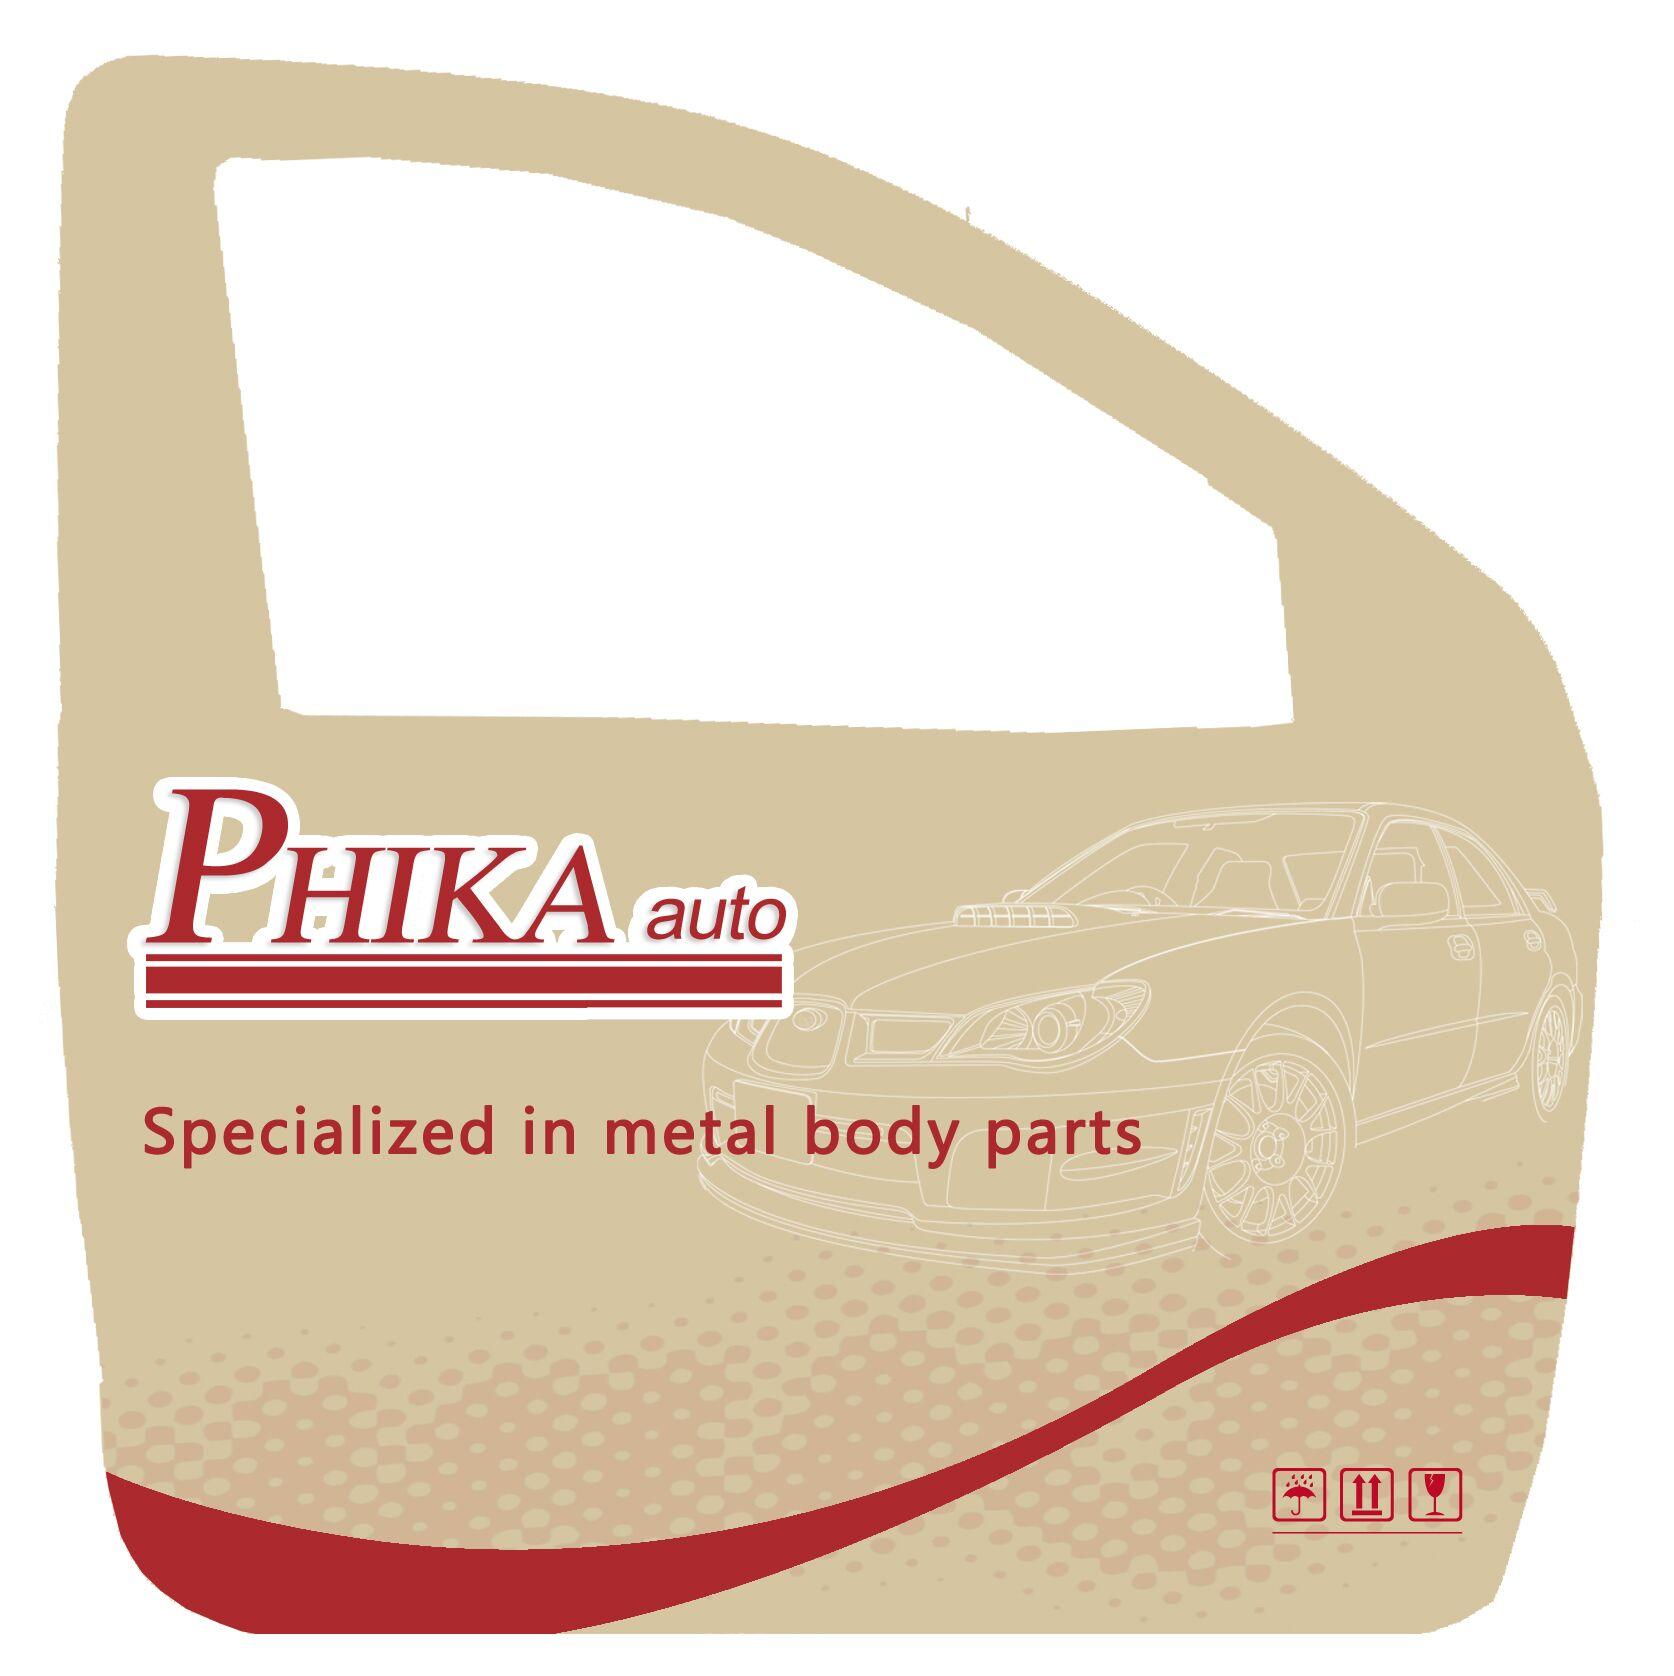 Auto Body Parts Front And Rear Car Door For Russia Type Kia Rio